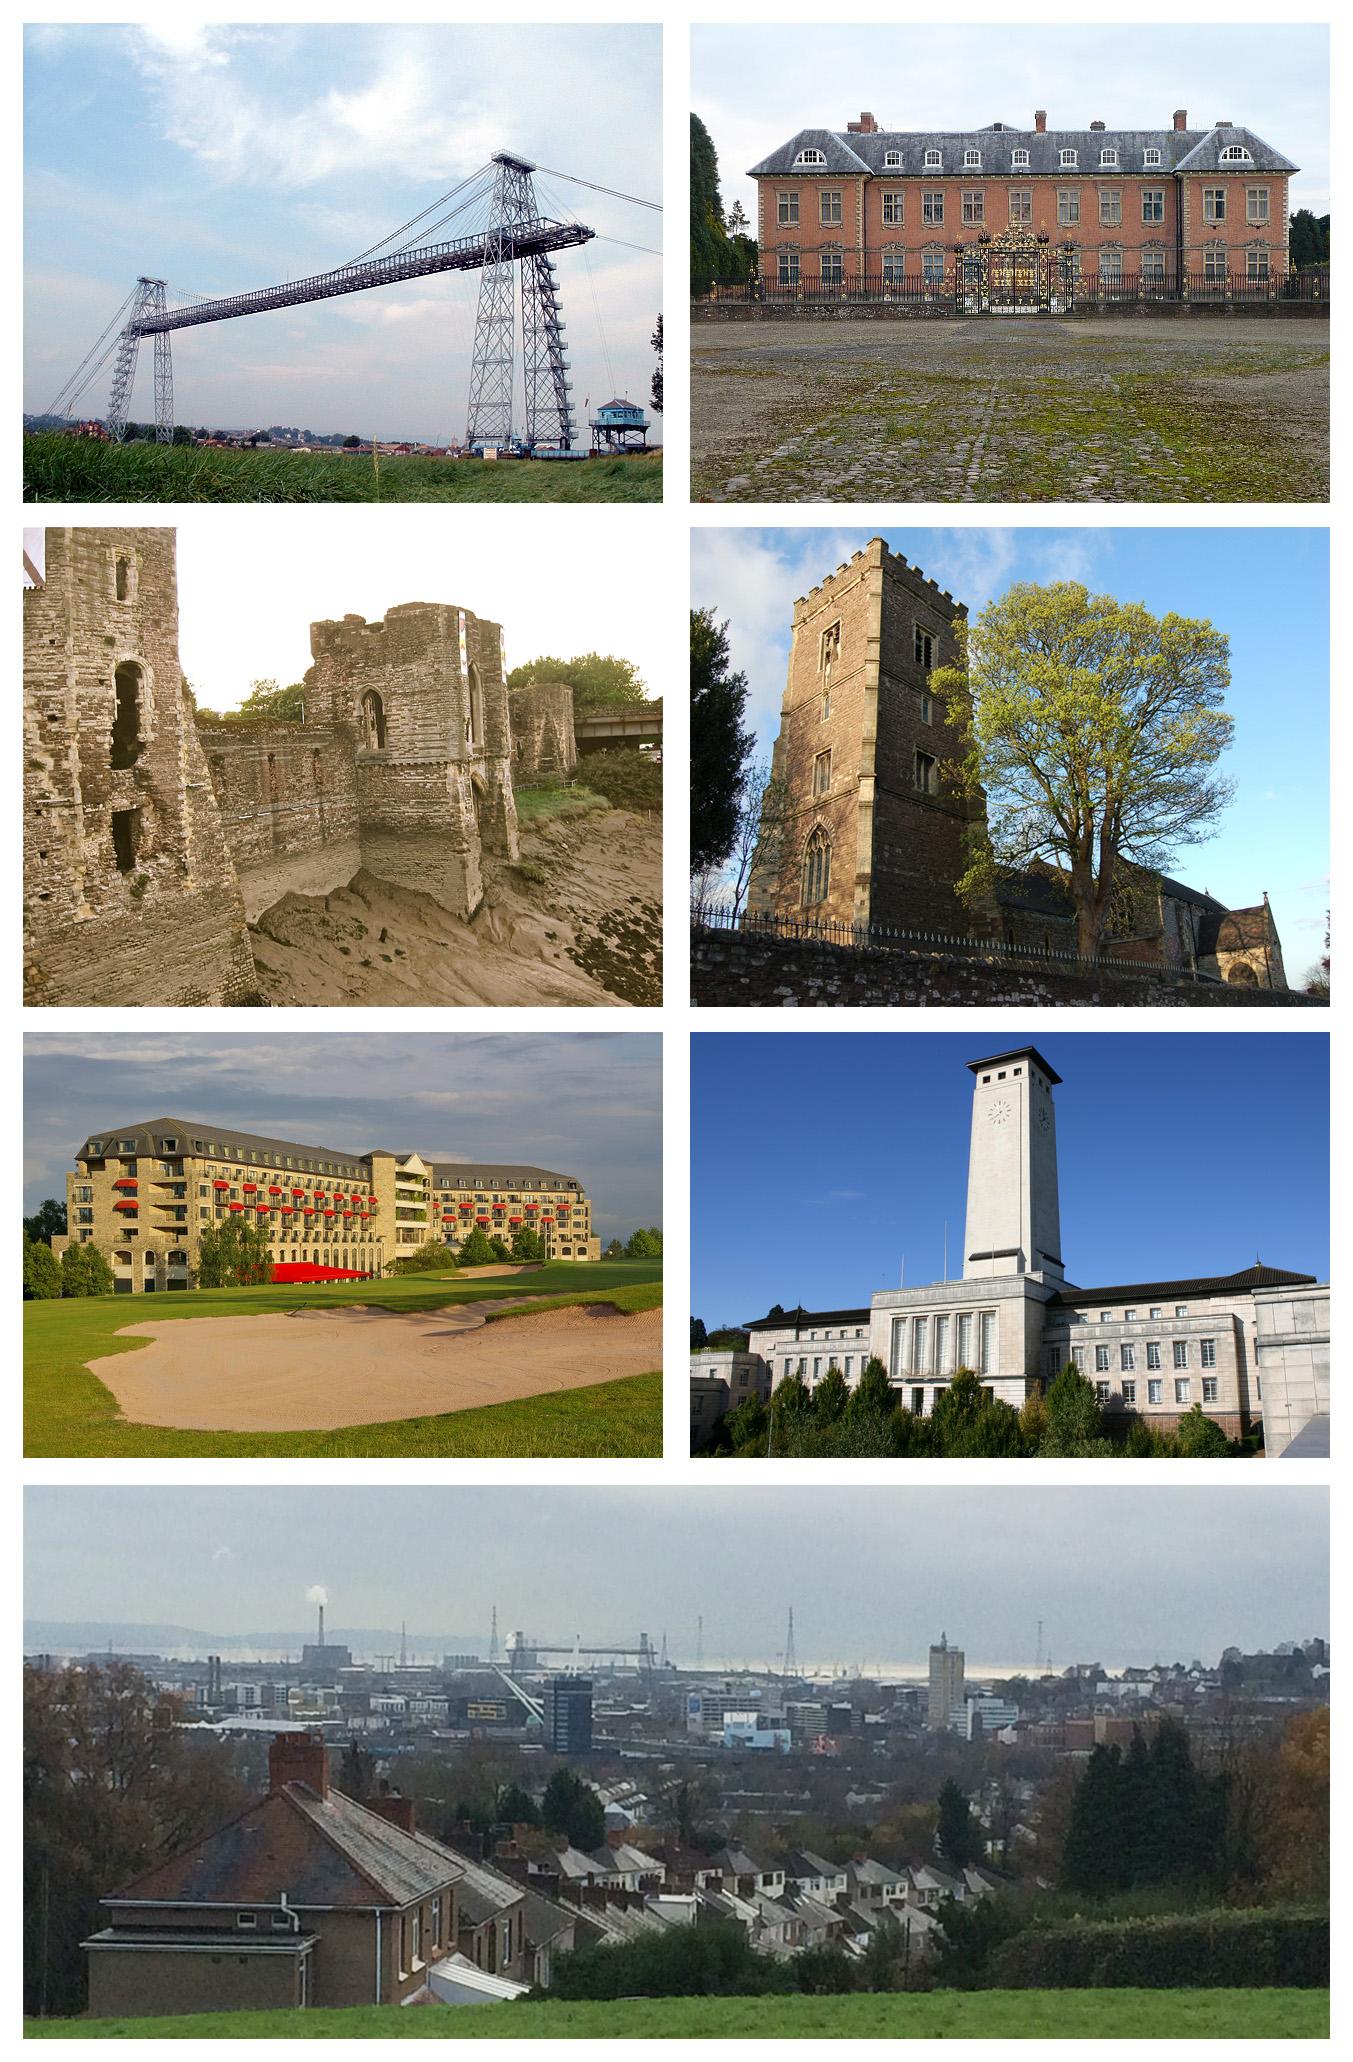 Newport, Wales - Wikipedia